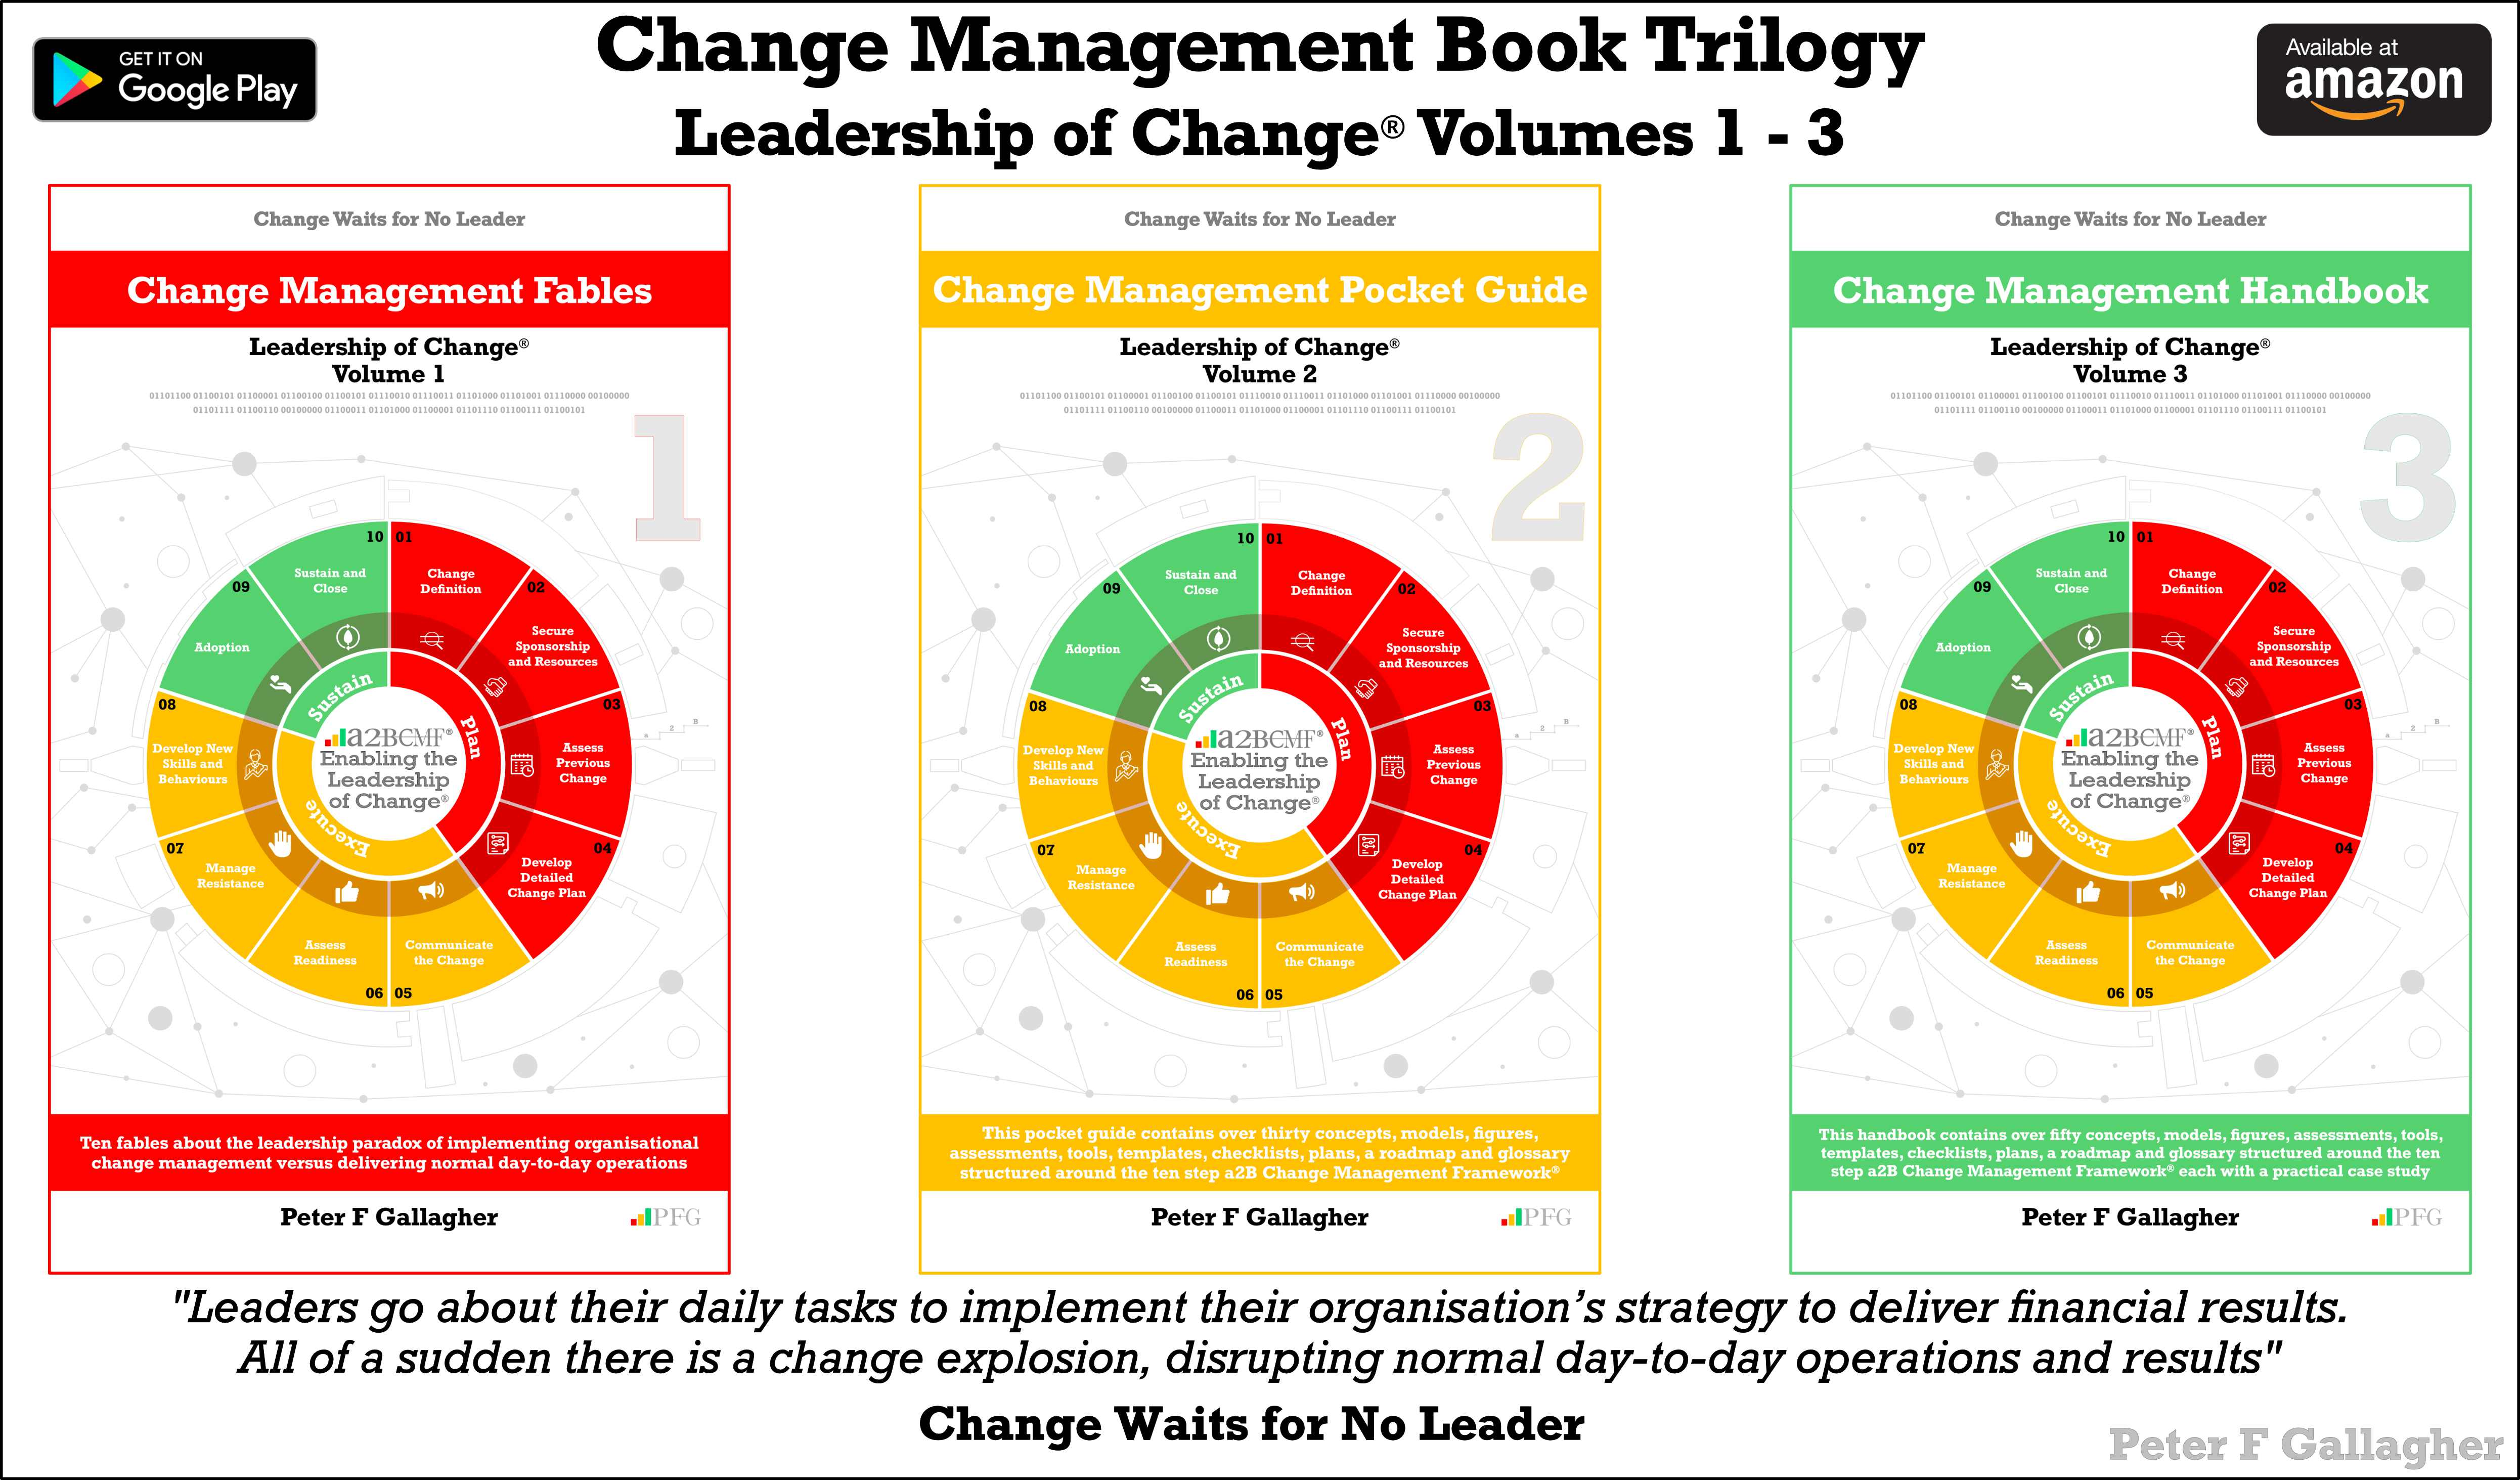 Change Management Book Trilogy - Leadership of Change Volumes 1 – 3  A, Change Management Fables, Ch